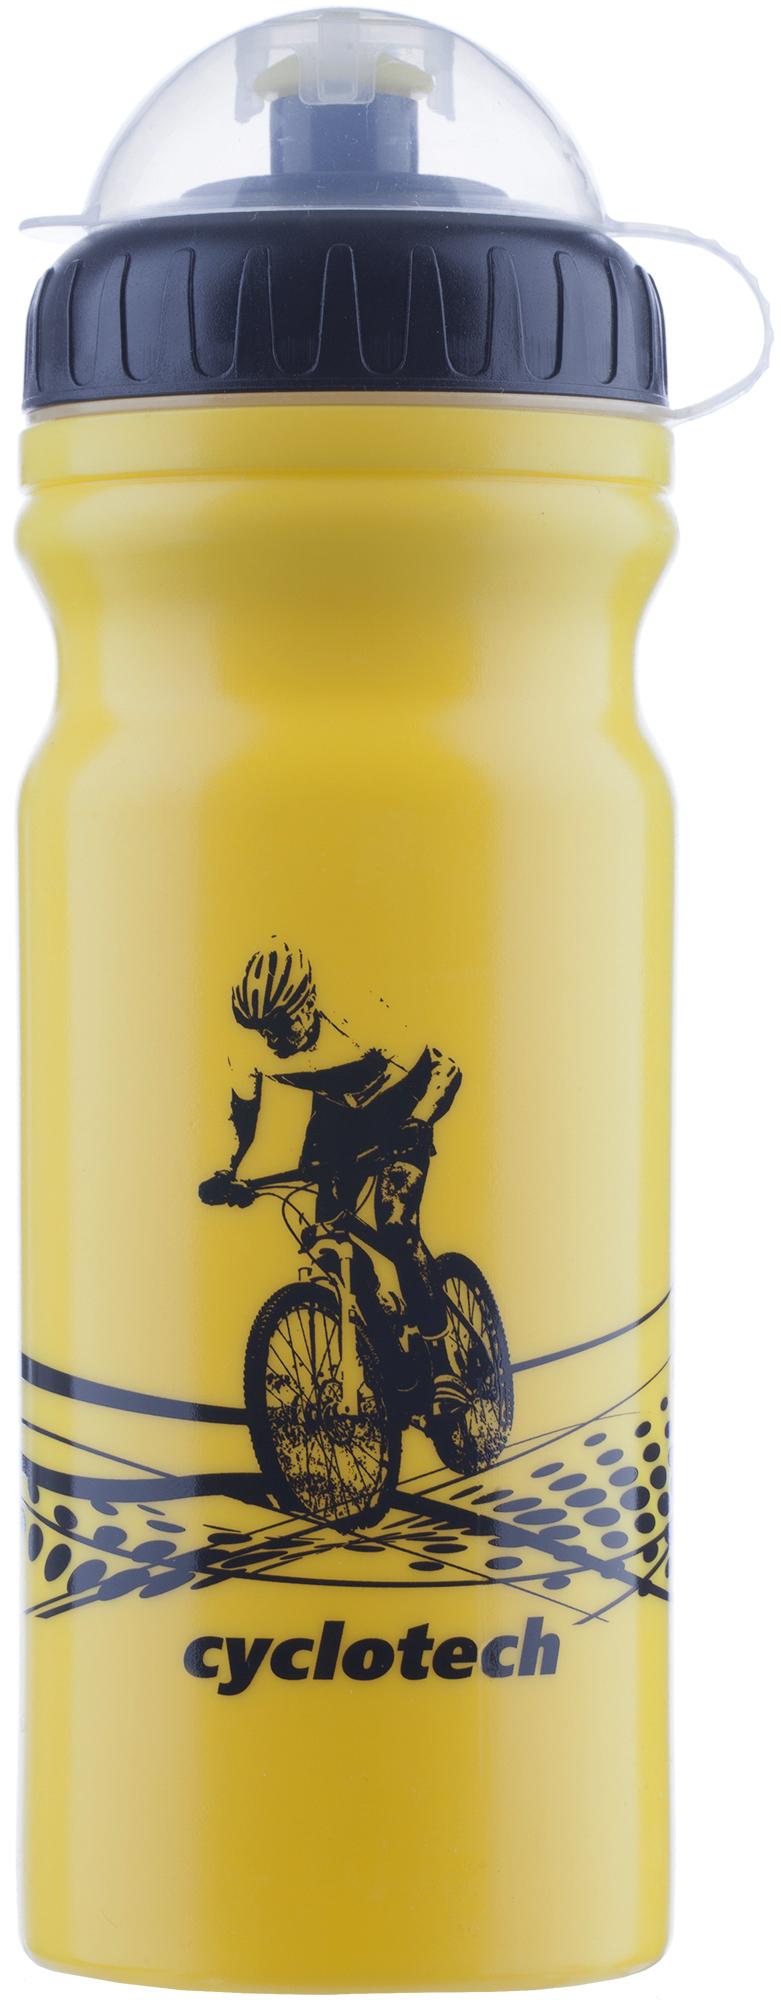 Cyclotech Фляжка велосипедная Cyclotech belvedere коррекция объ ма